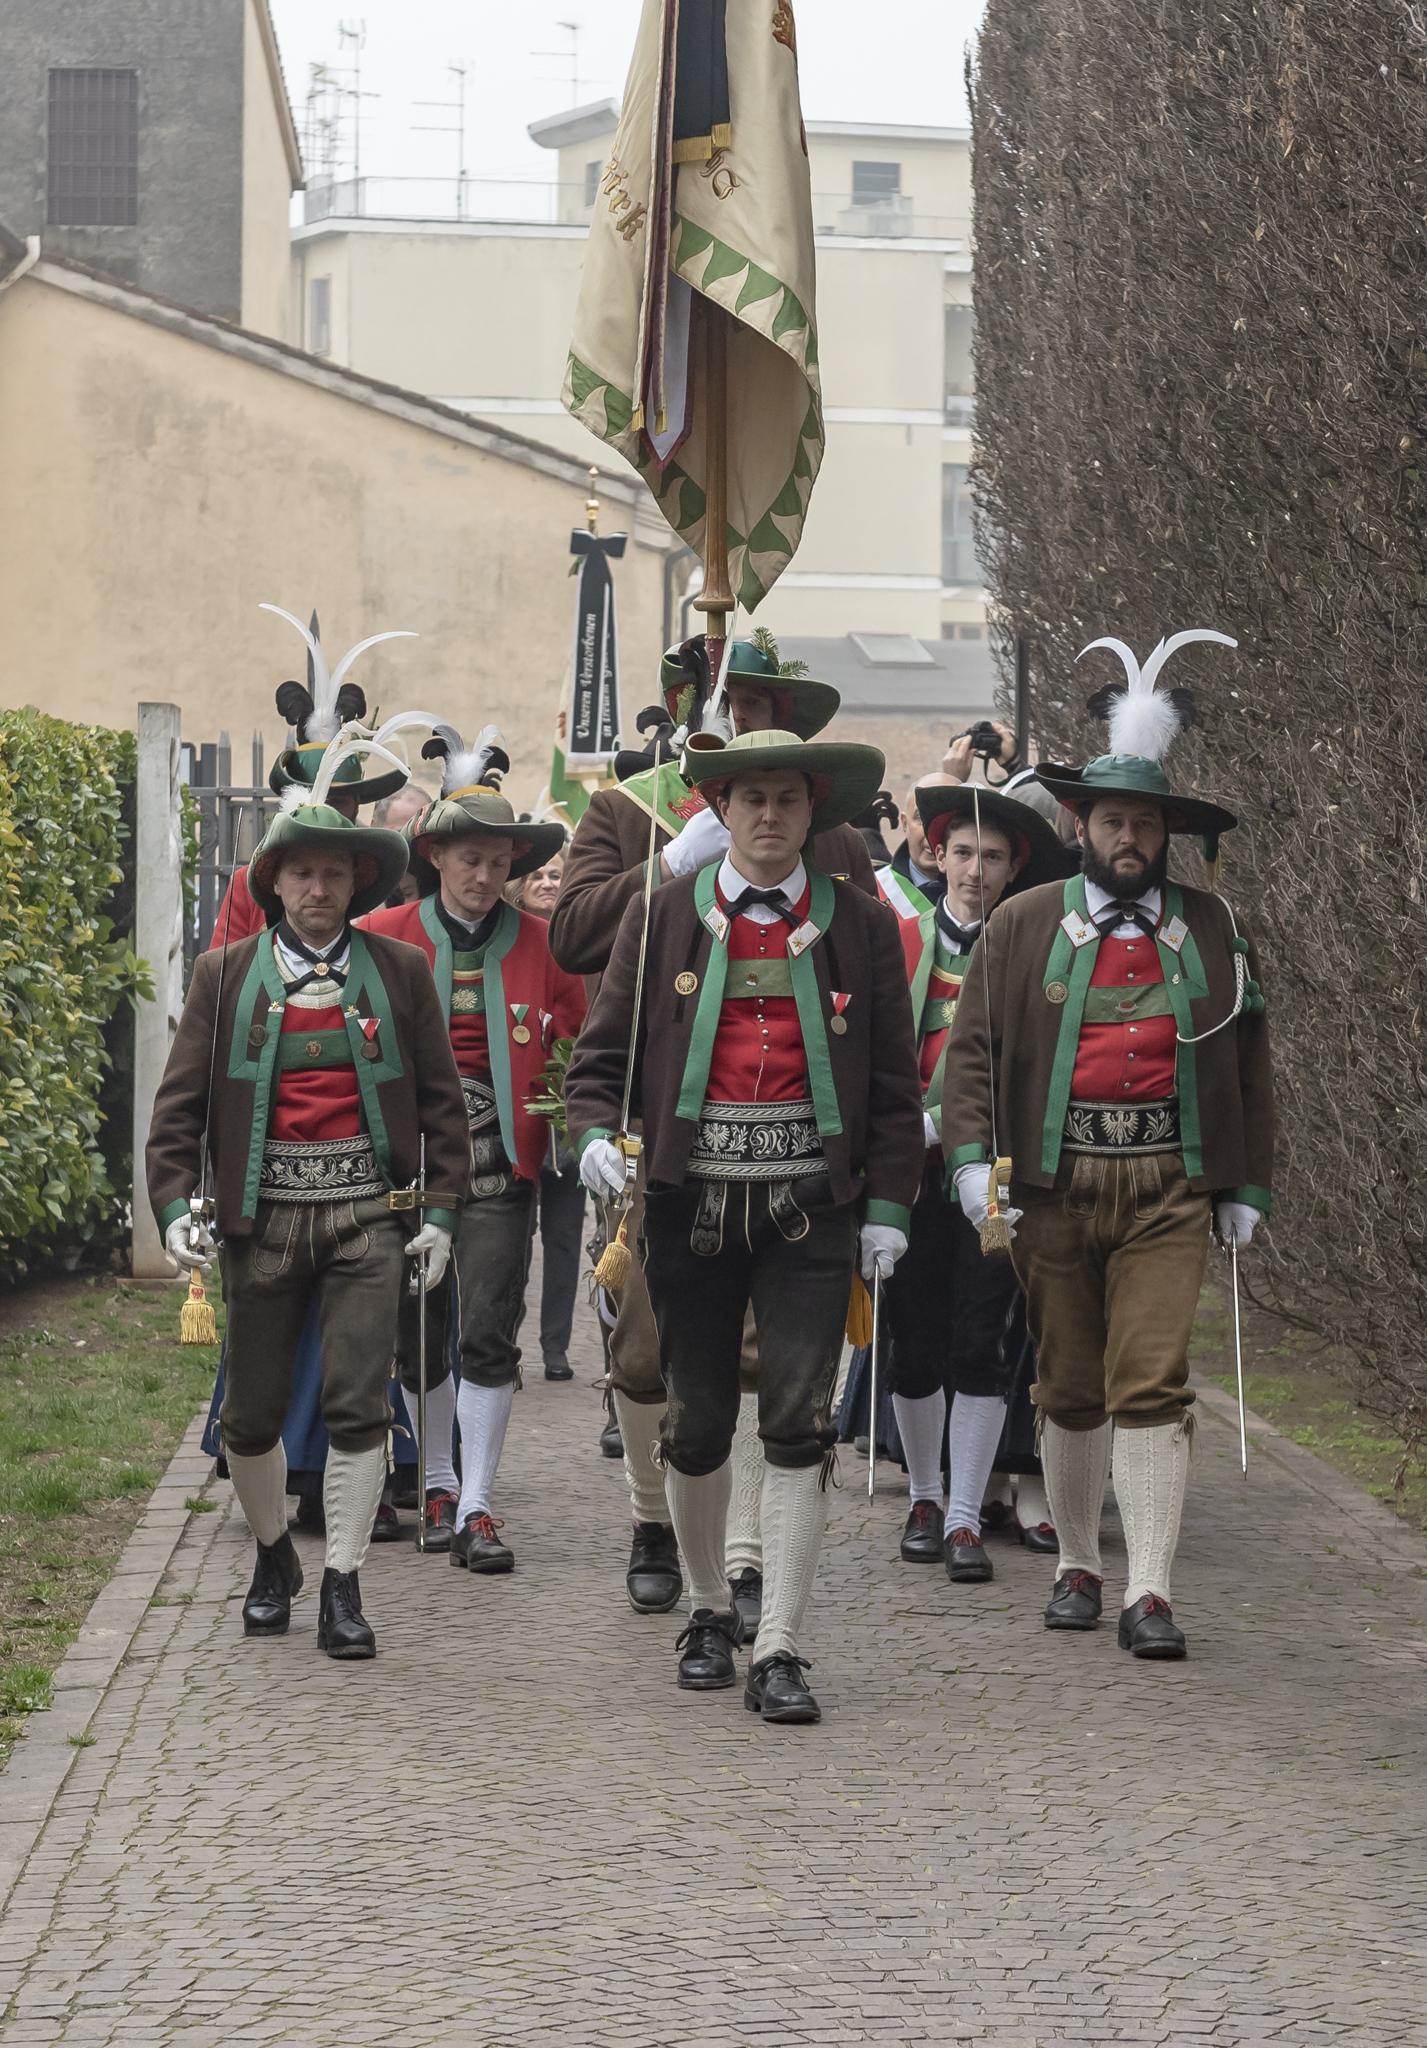 Andreas-Hofer Feier in Mantua 20.02.2019